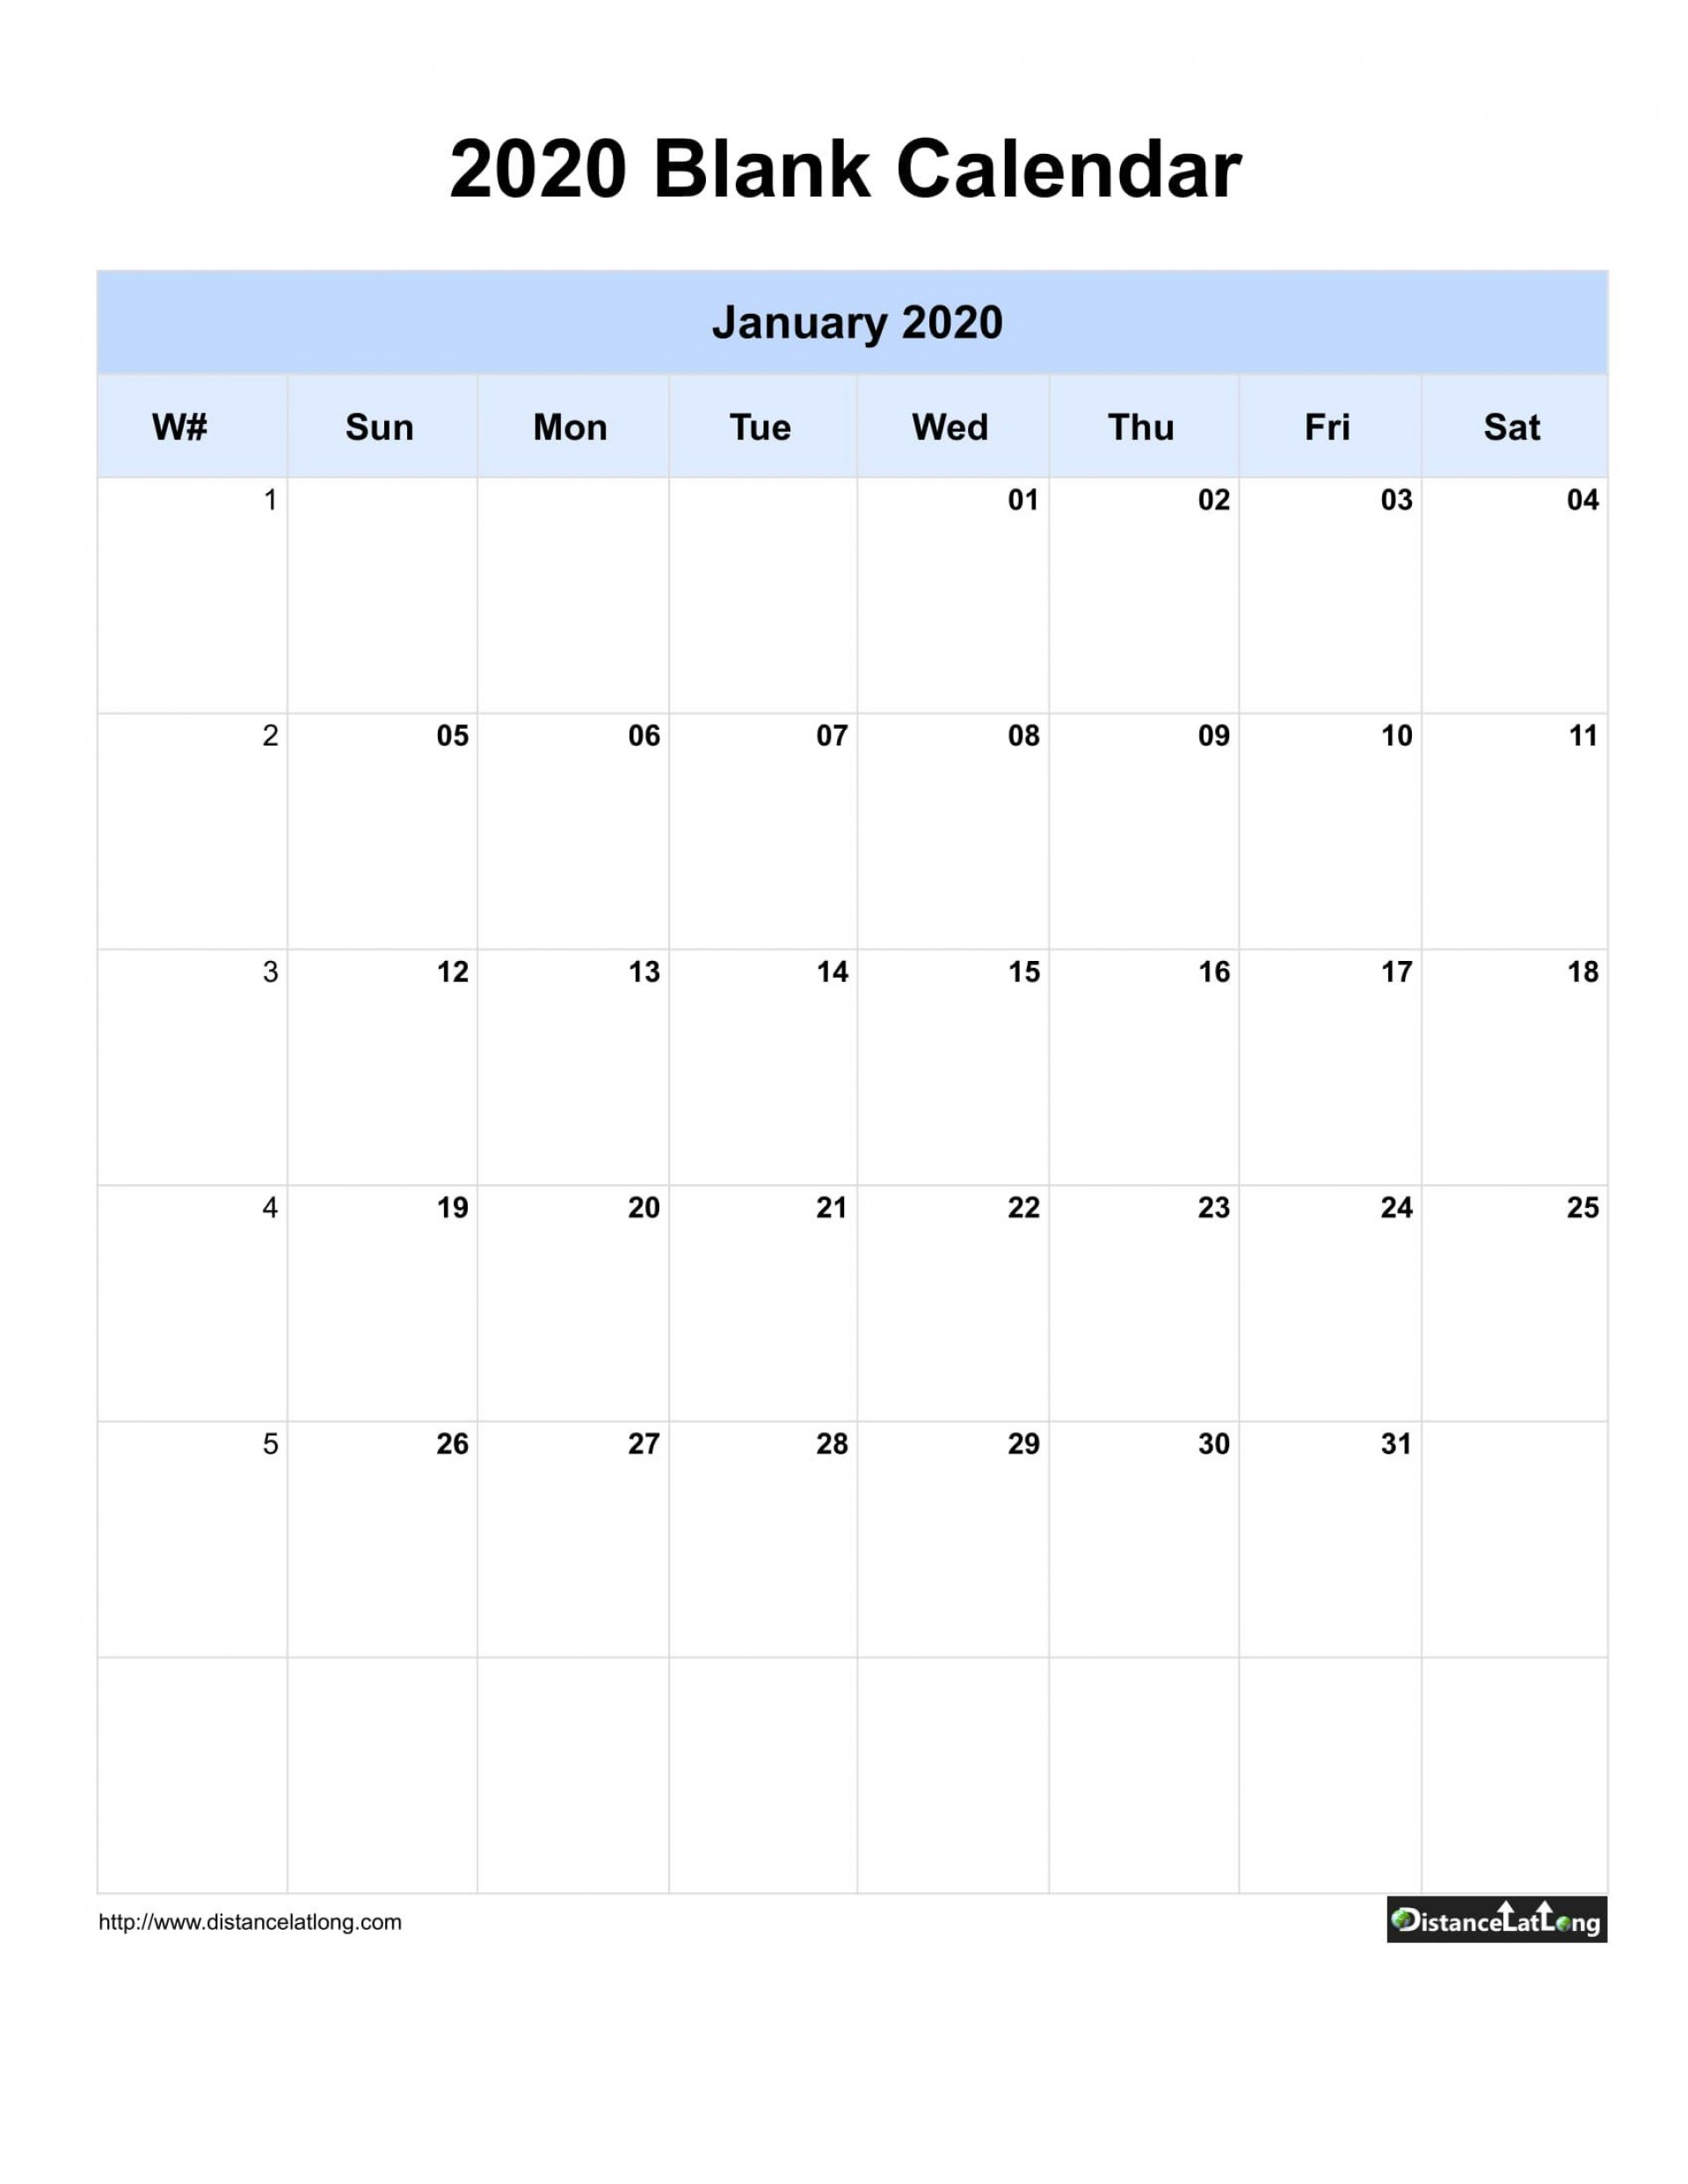 004 Impressive Calendar Template For Word 2010 Inspiration  2019 Microsoft1920